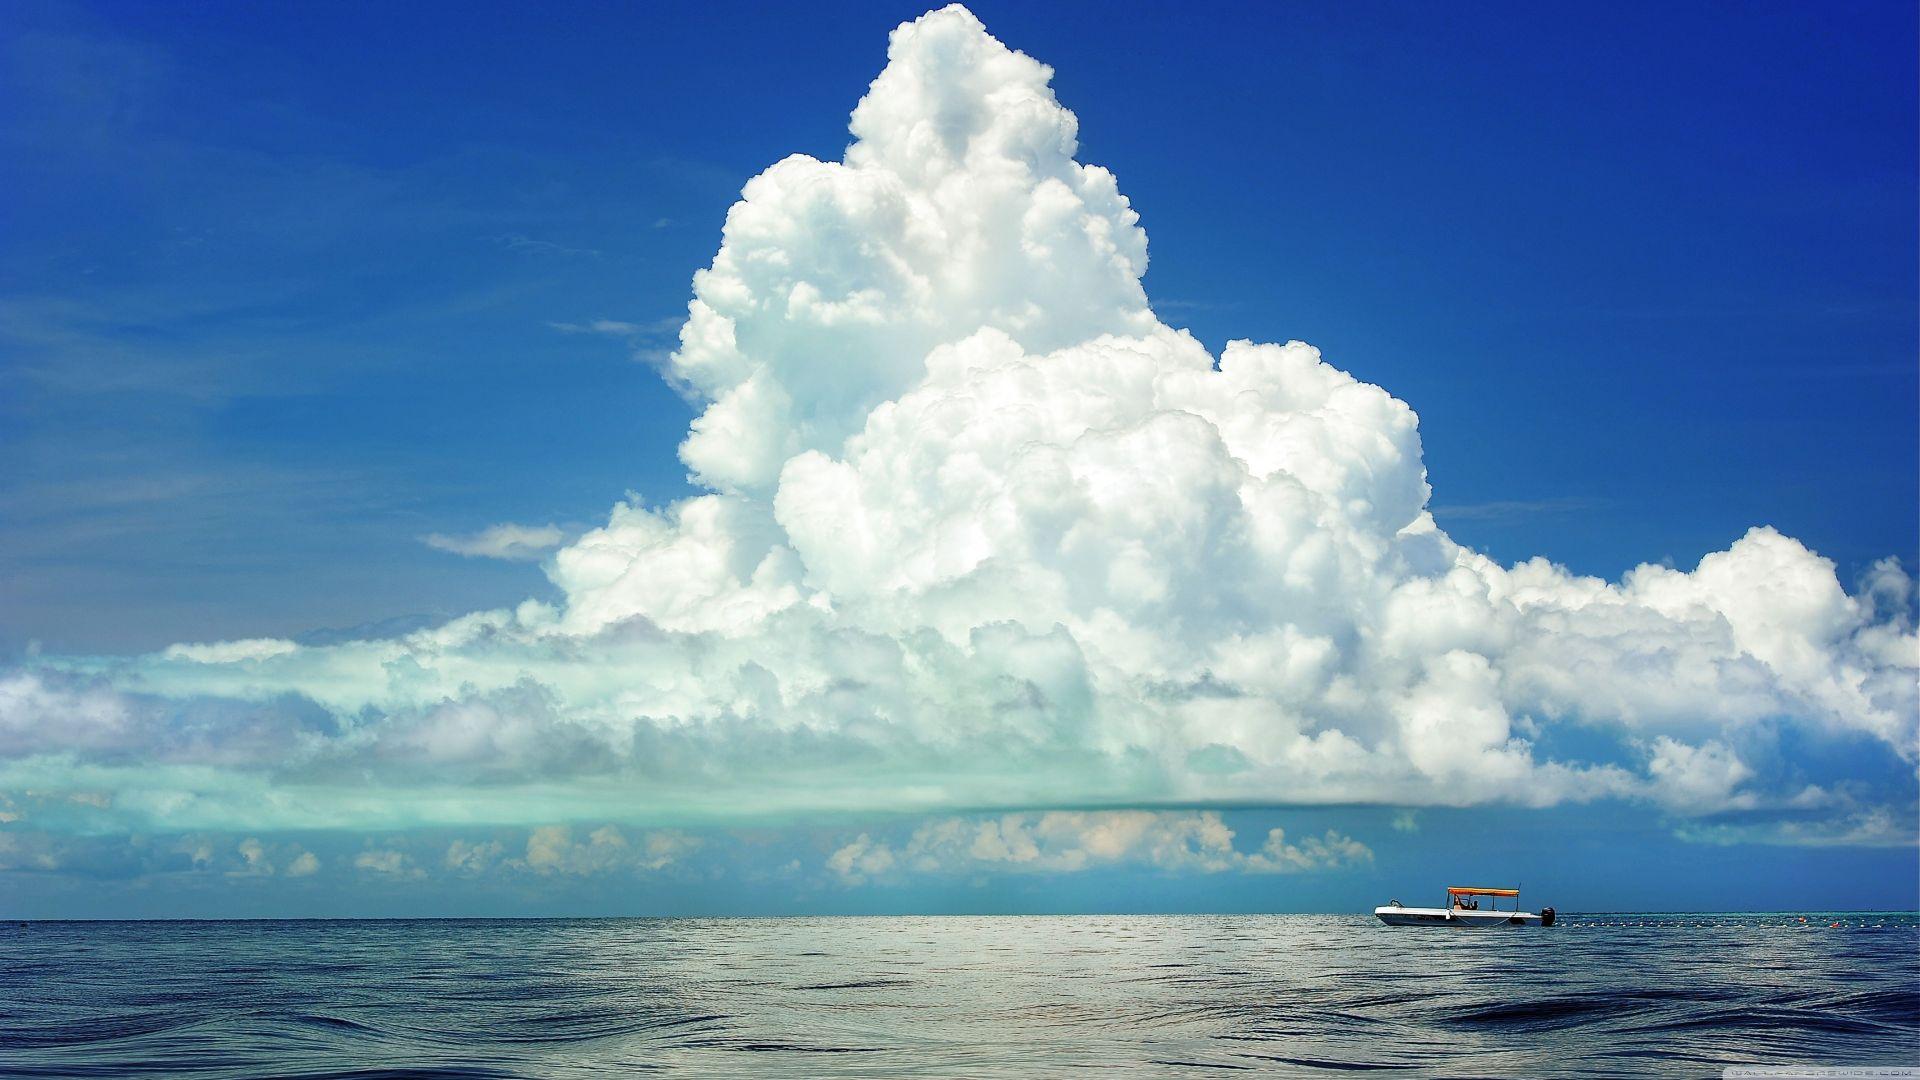 wallpaper cumulus clouds 4k hd wallpaper sky sea nature 11474. Black Bedroom Furniture Sets. Home Design Ideas